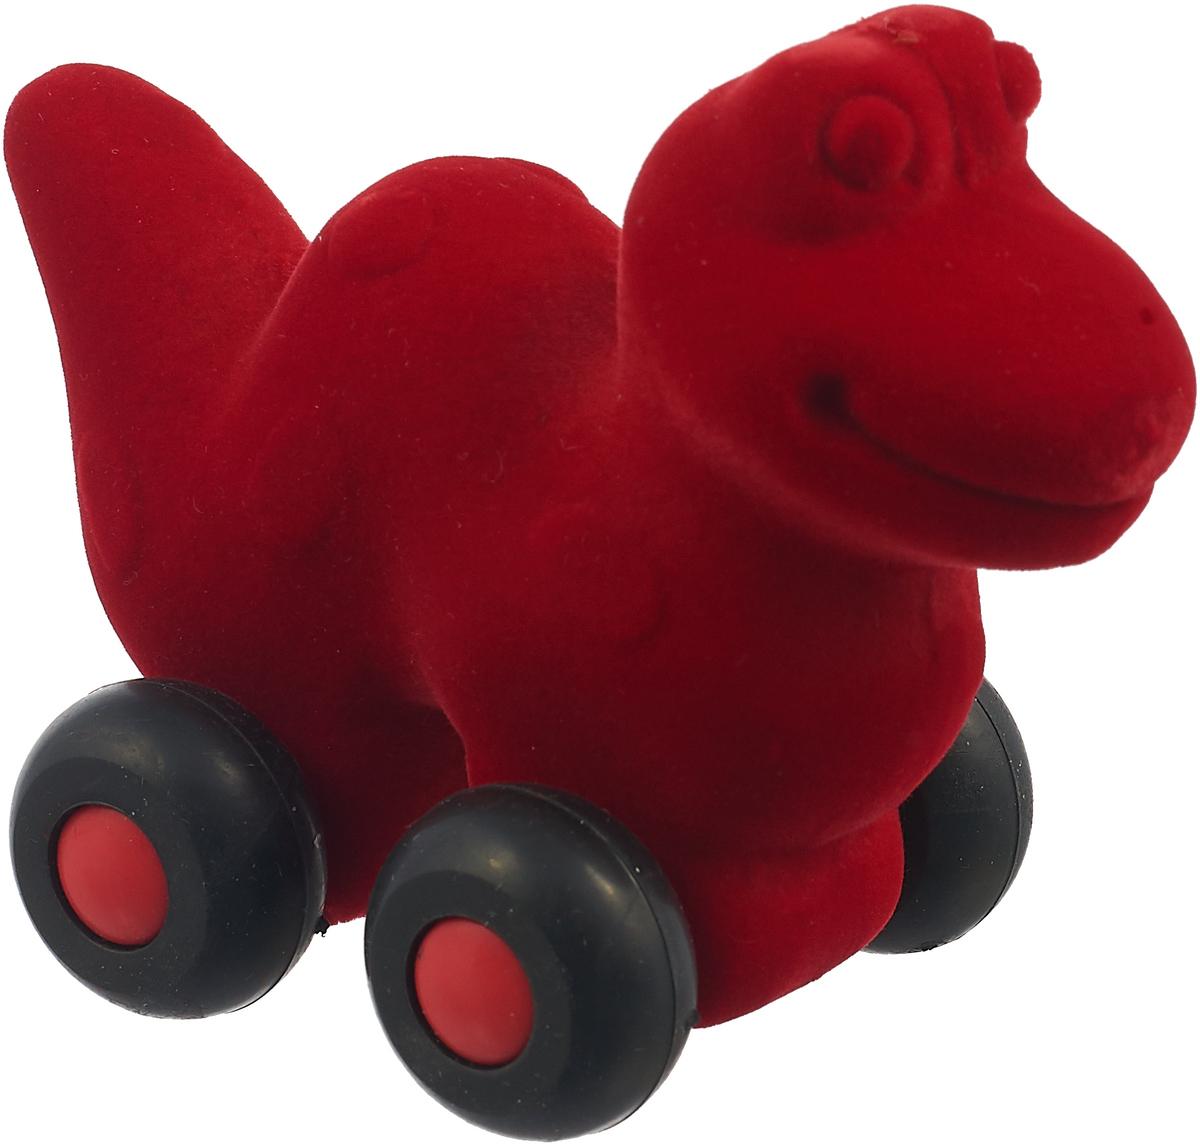 Rubbabu Фигурка функциональная Змея цвет красный цвет красный